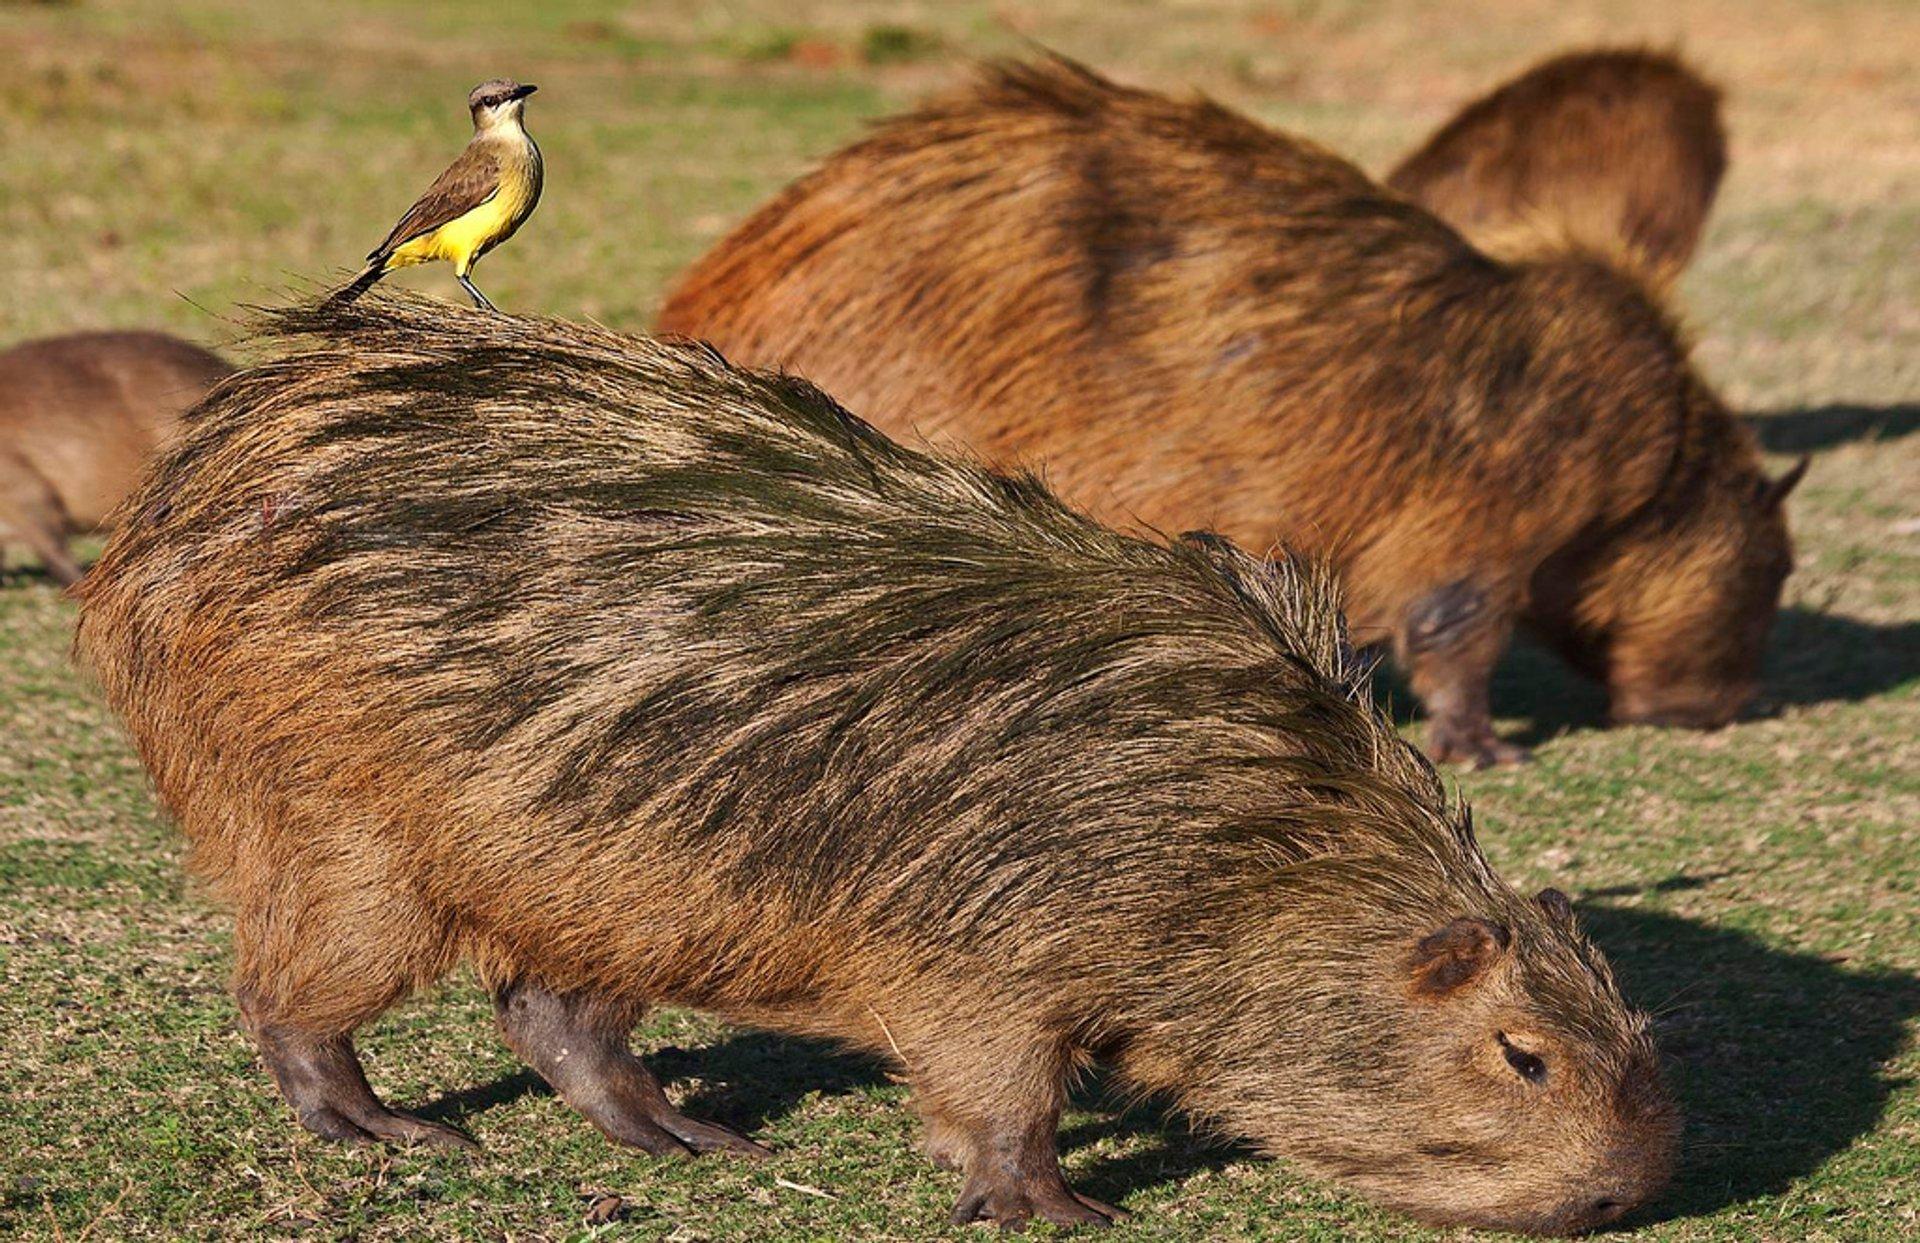 Capybara Watching (Breeding Season) in Rio de Janeiro - Best Season 2020